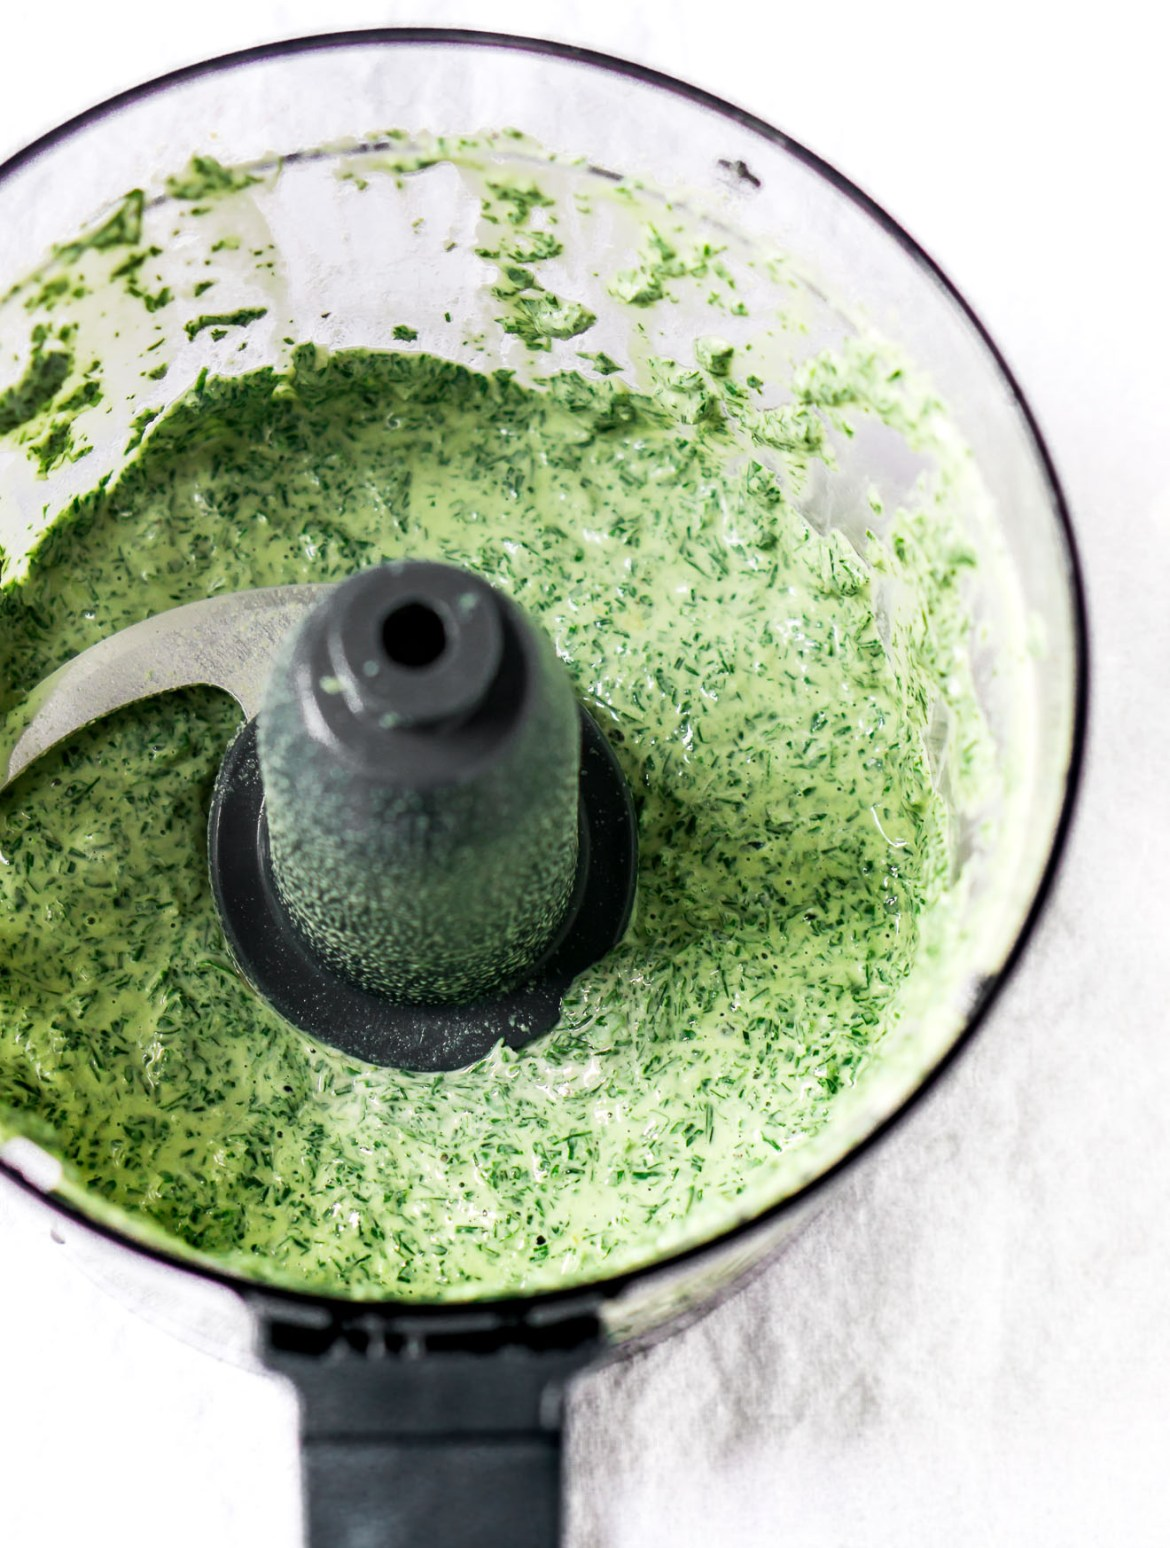 Herbed-Green-Goddess-Dressing-Simple-To-Make-10-Ingredients